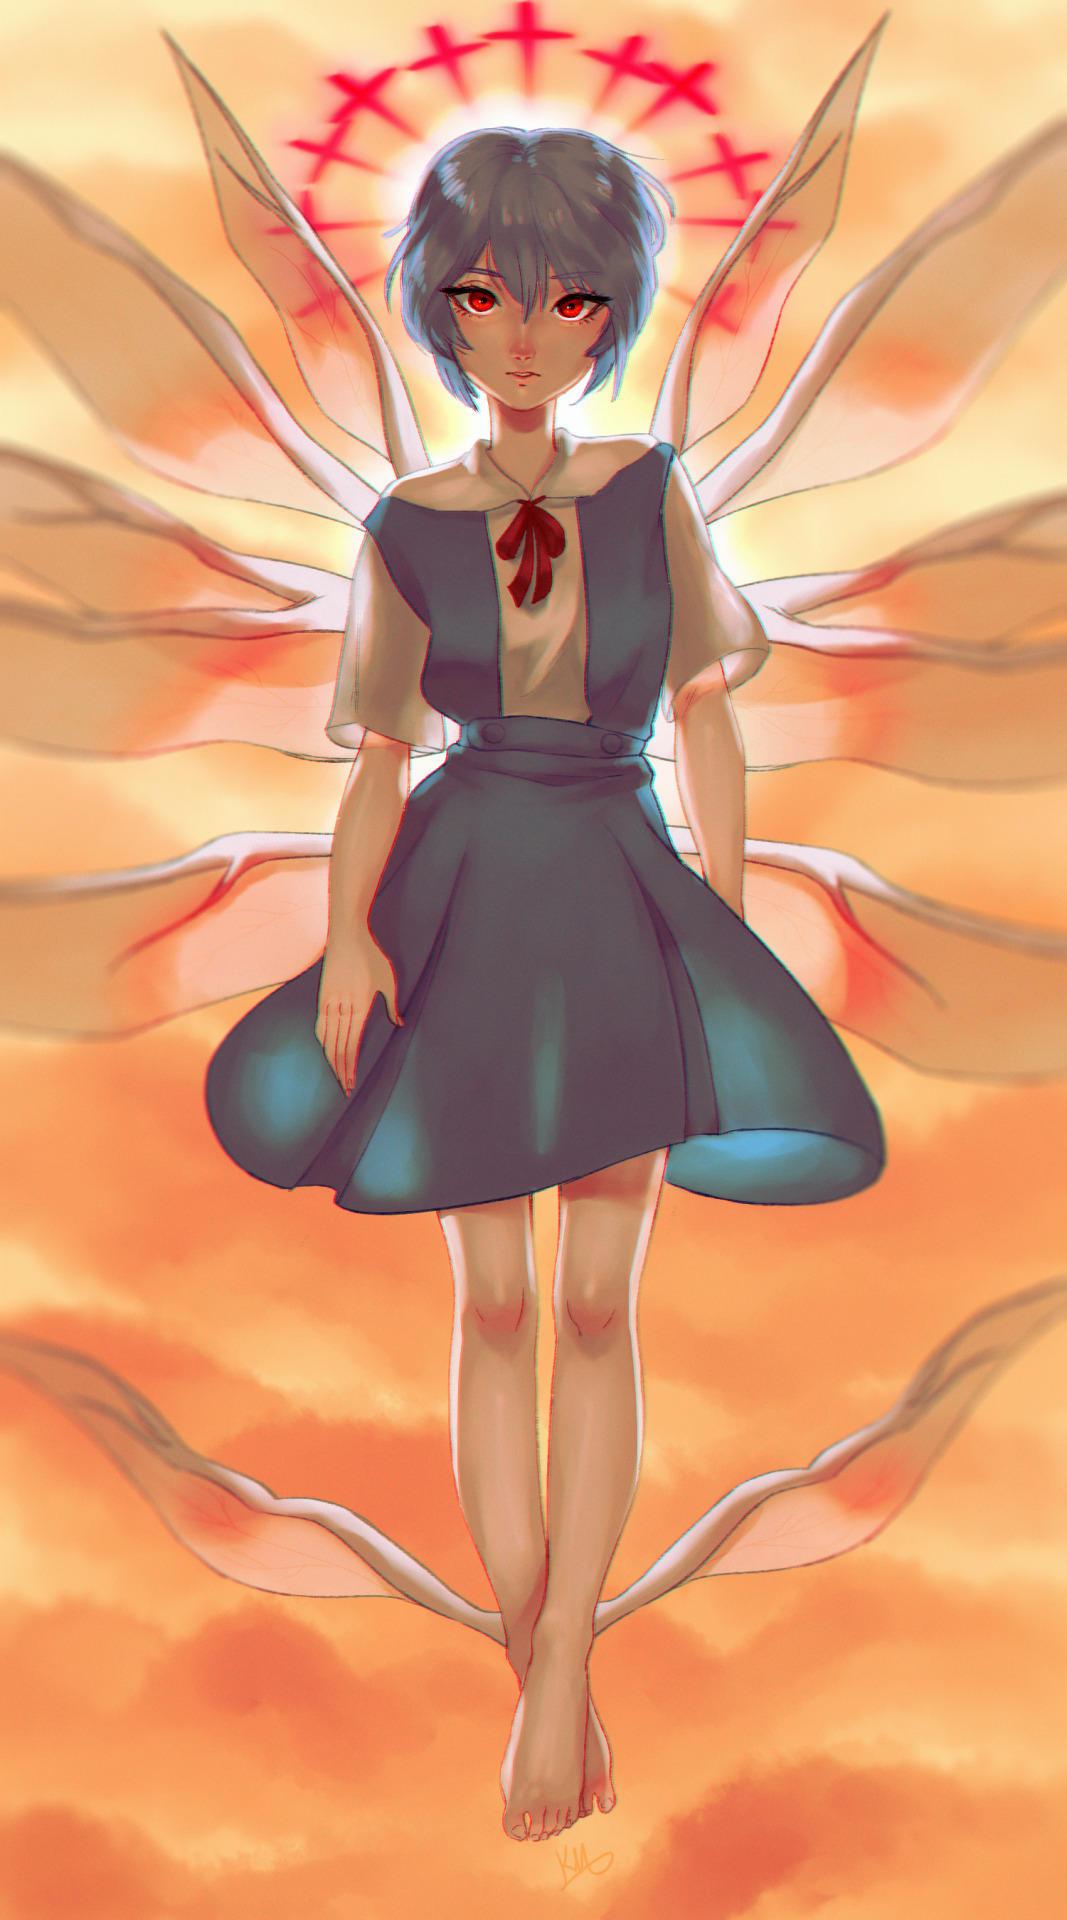 Lilith Neon Genesis Evangelion Know Your Meme